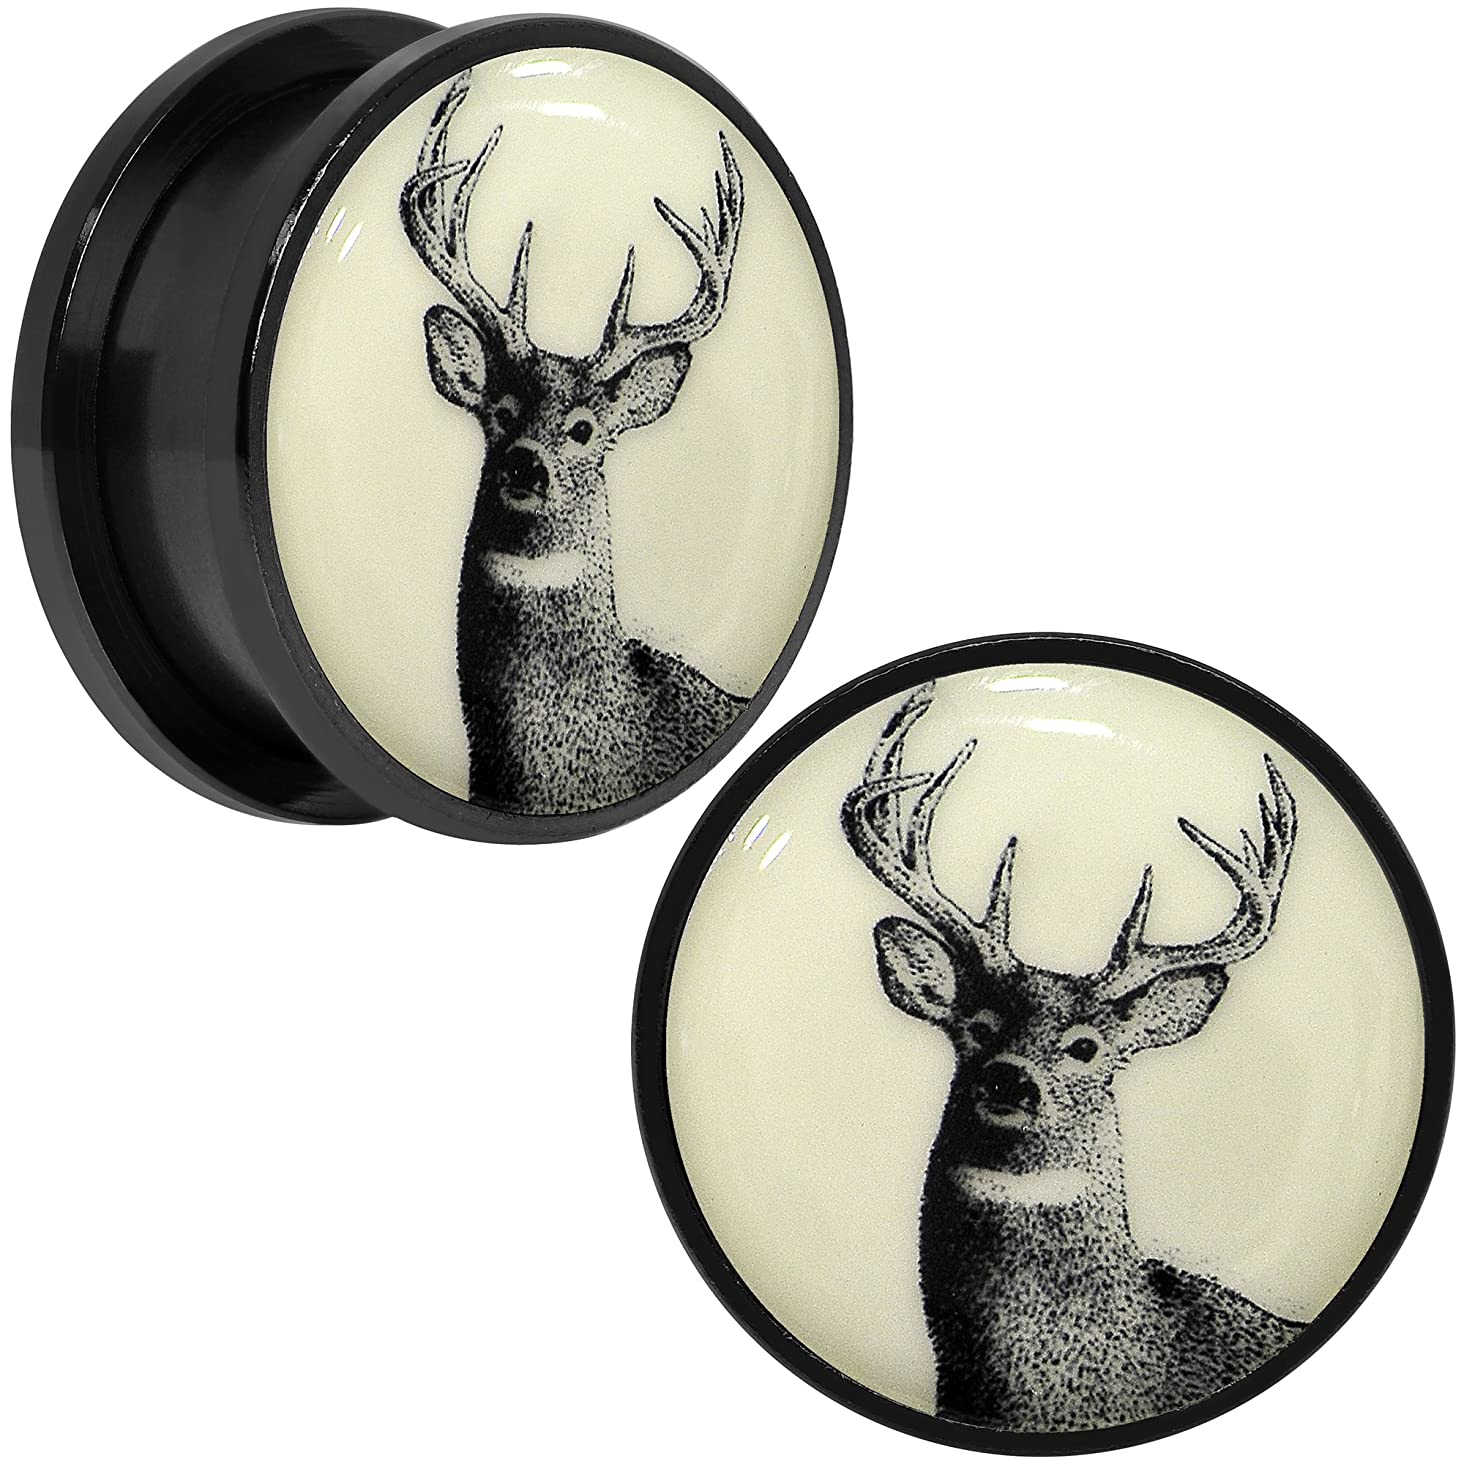 Body Candy Black Anodized Steel Buck Deer Glow in The Dark Screw Fit Ear Gauge Plug Pair 20mm